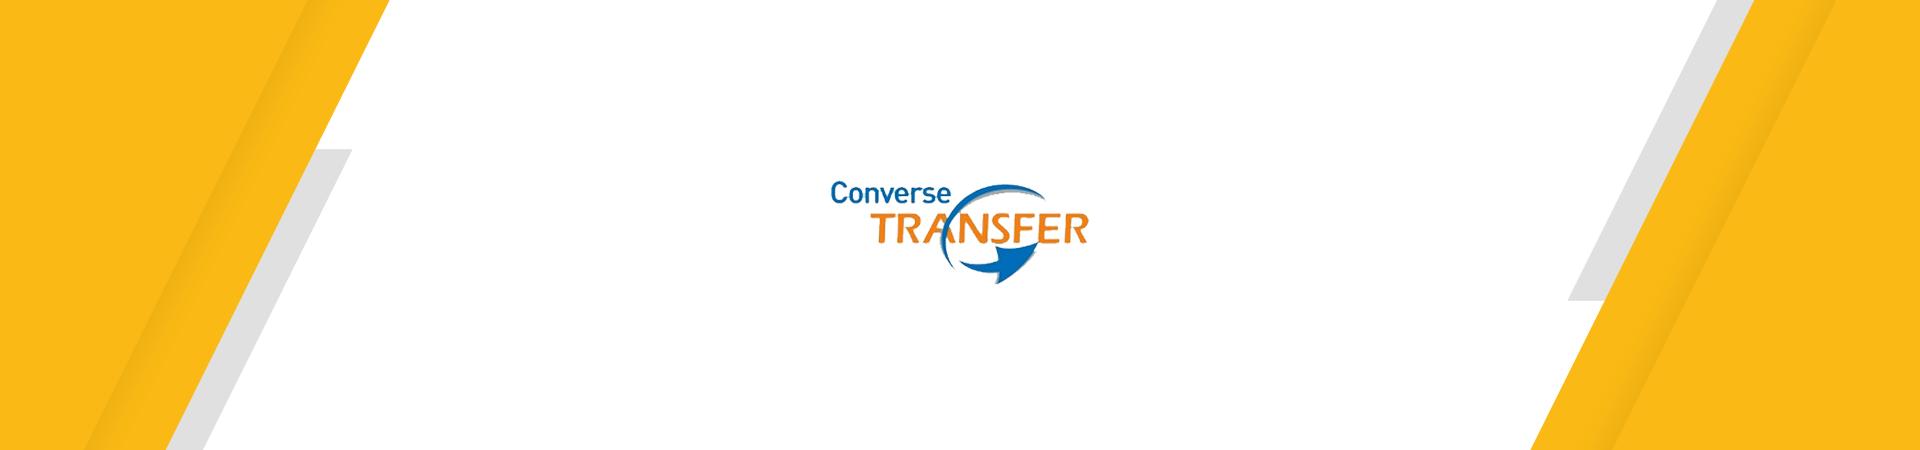 Converse Transfer